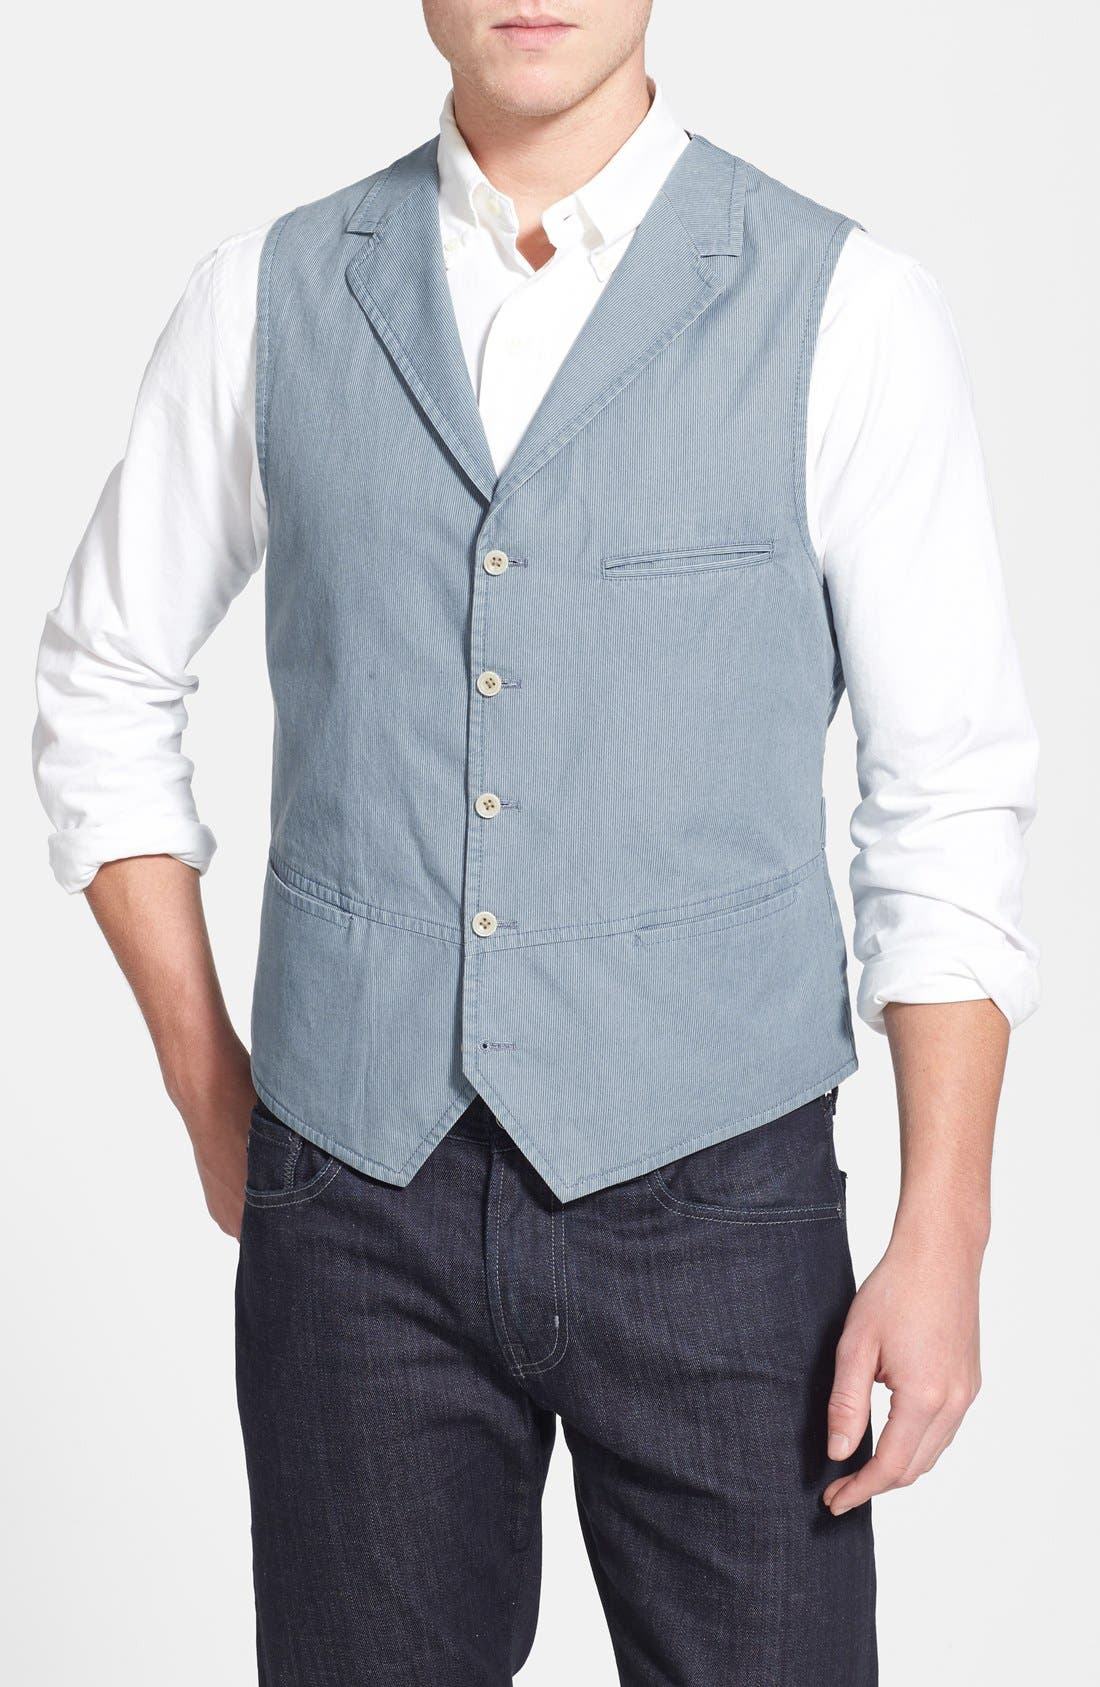 Main Image - Kroon 'Axel' Regular Fit Vest